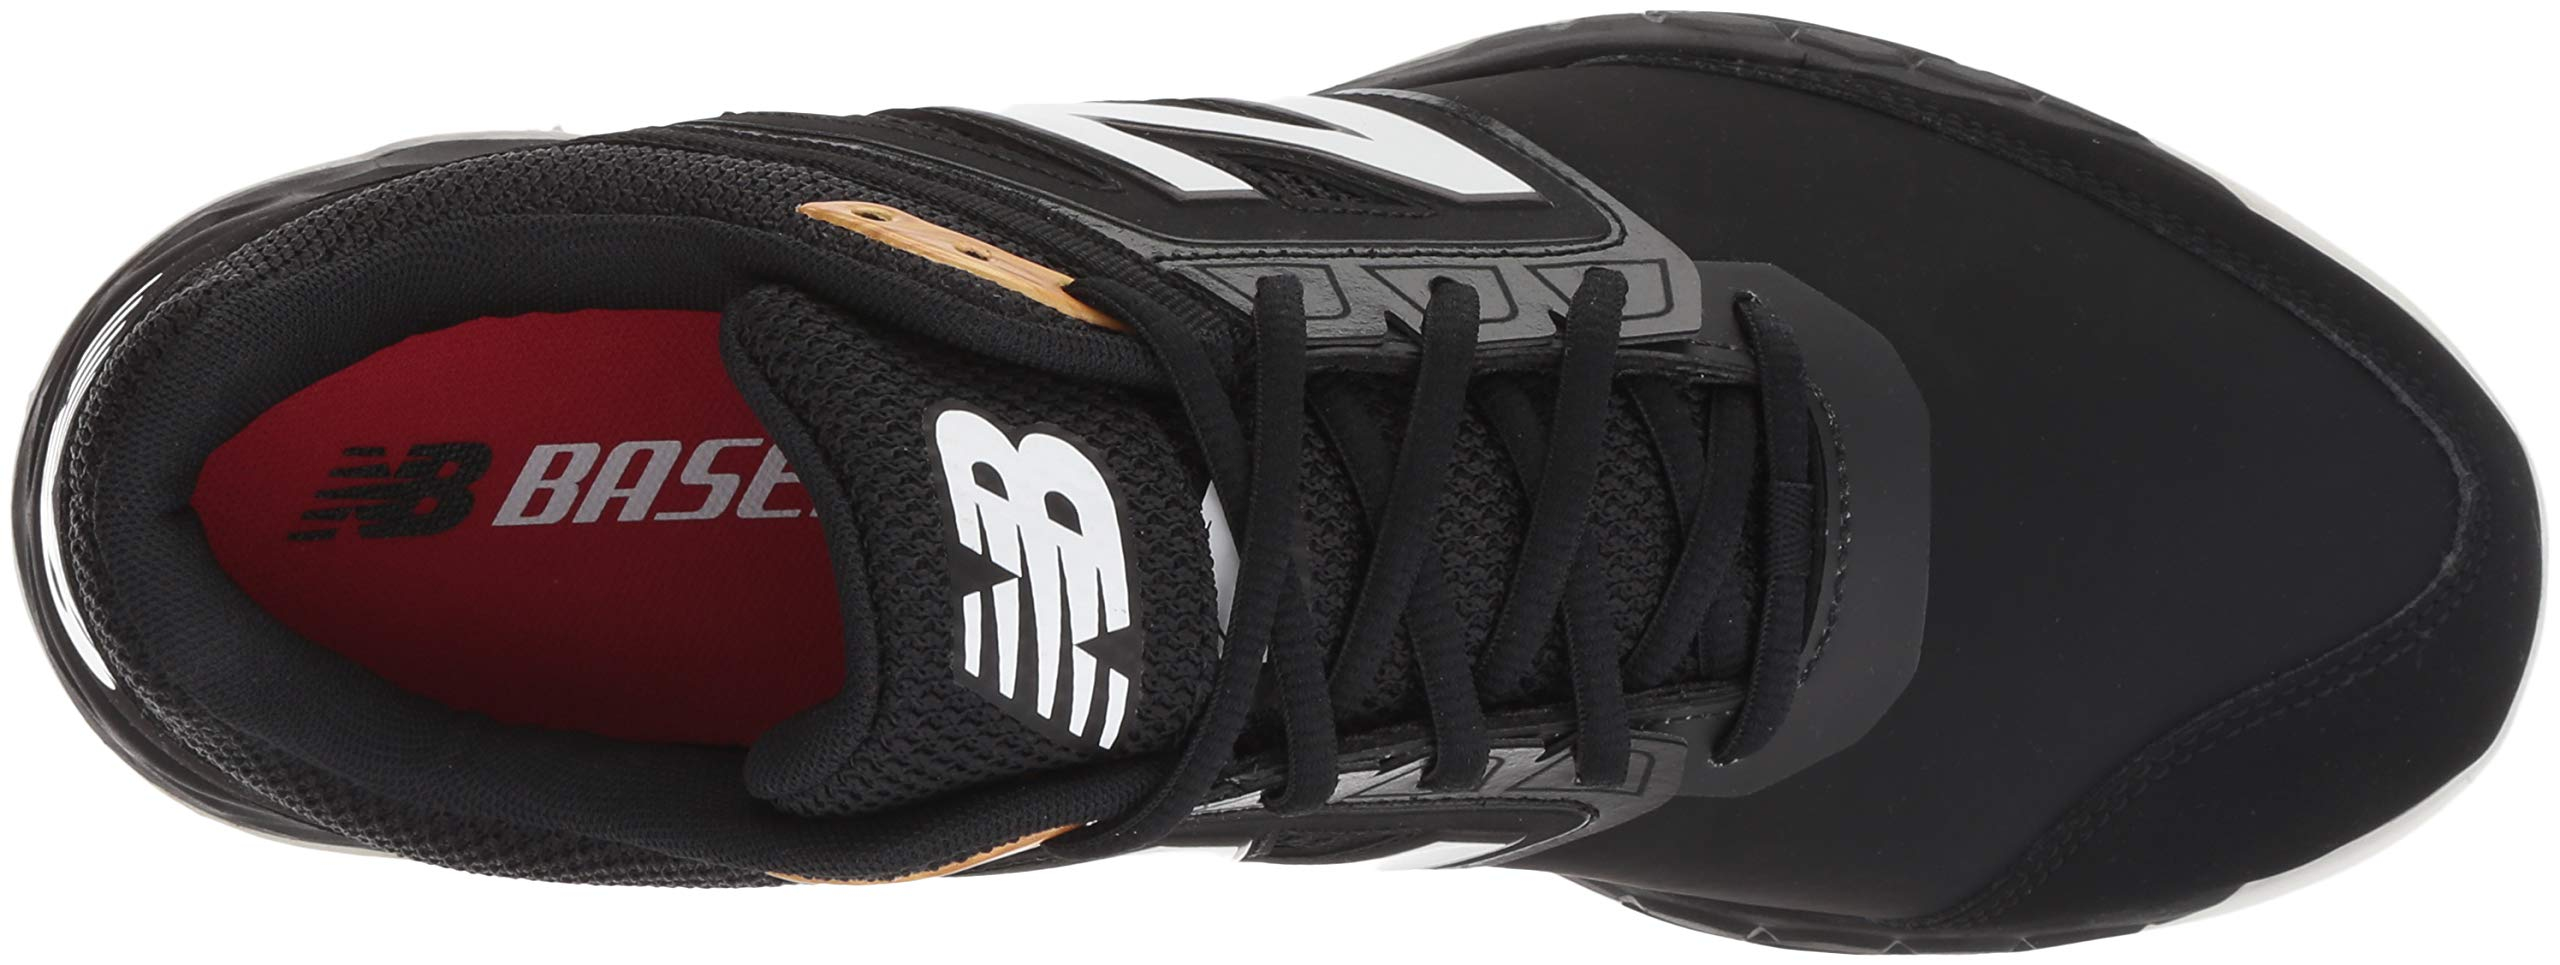 New Balance Men's 3000v4 Turf Baseball Shoe, Black, 5 D US by New Balance (Image #8)